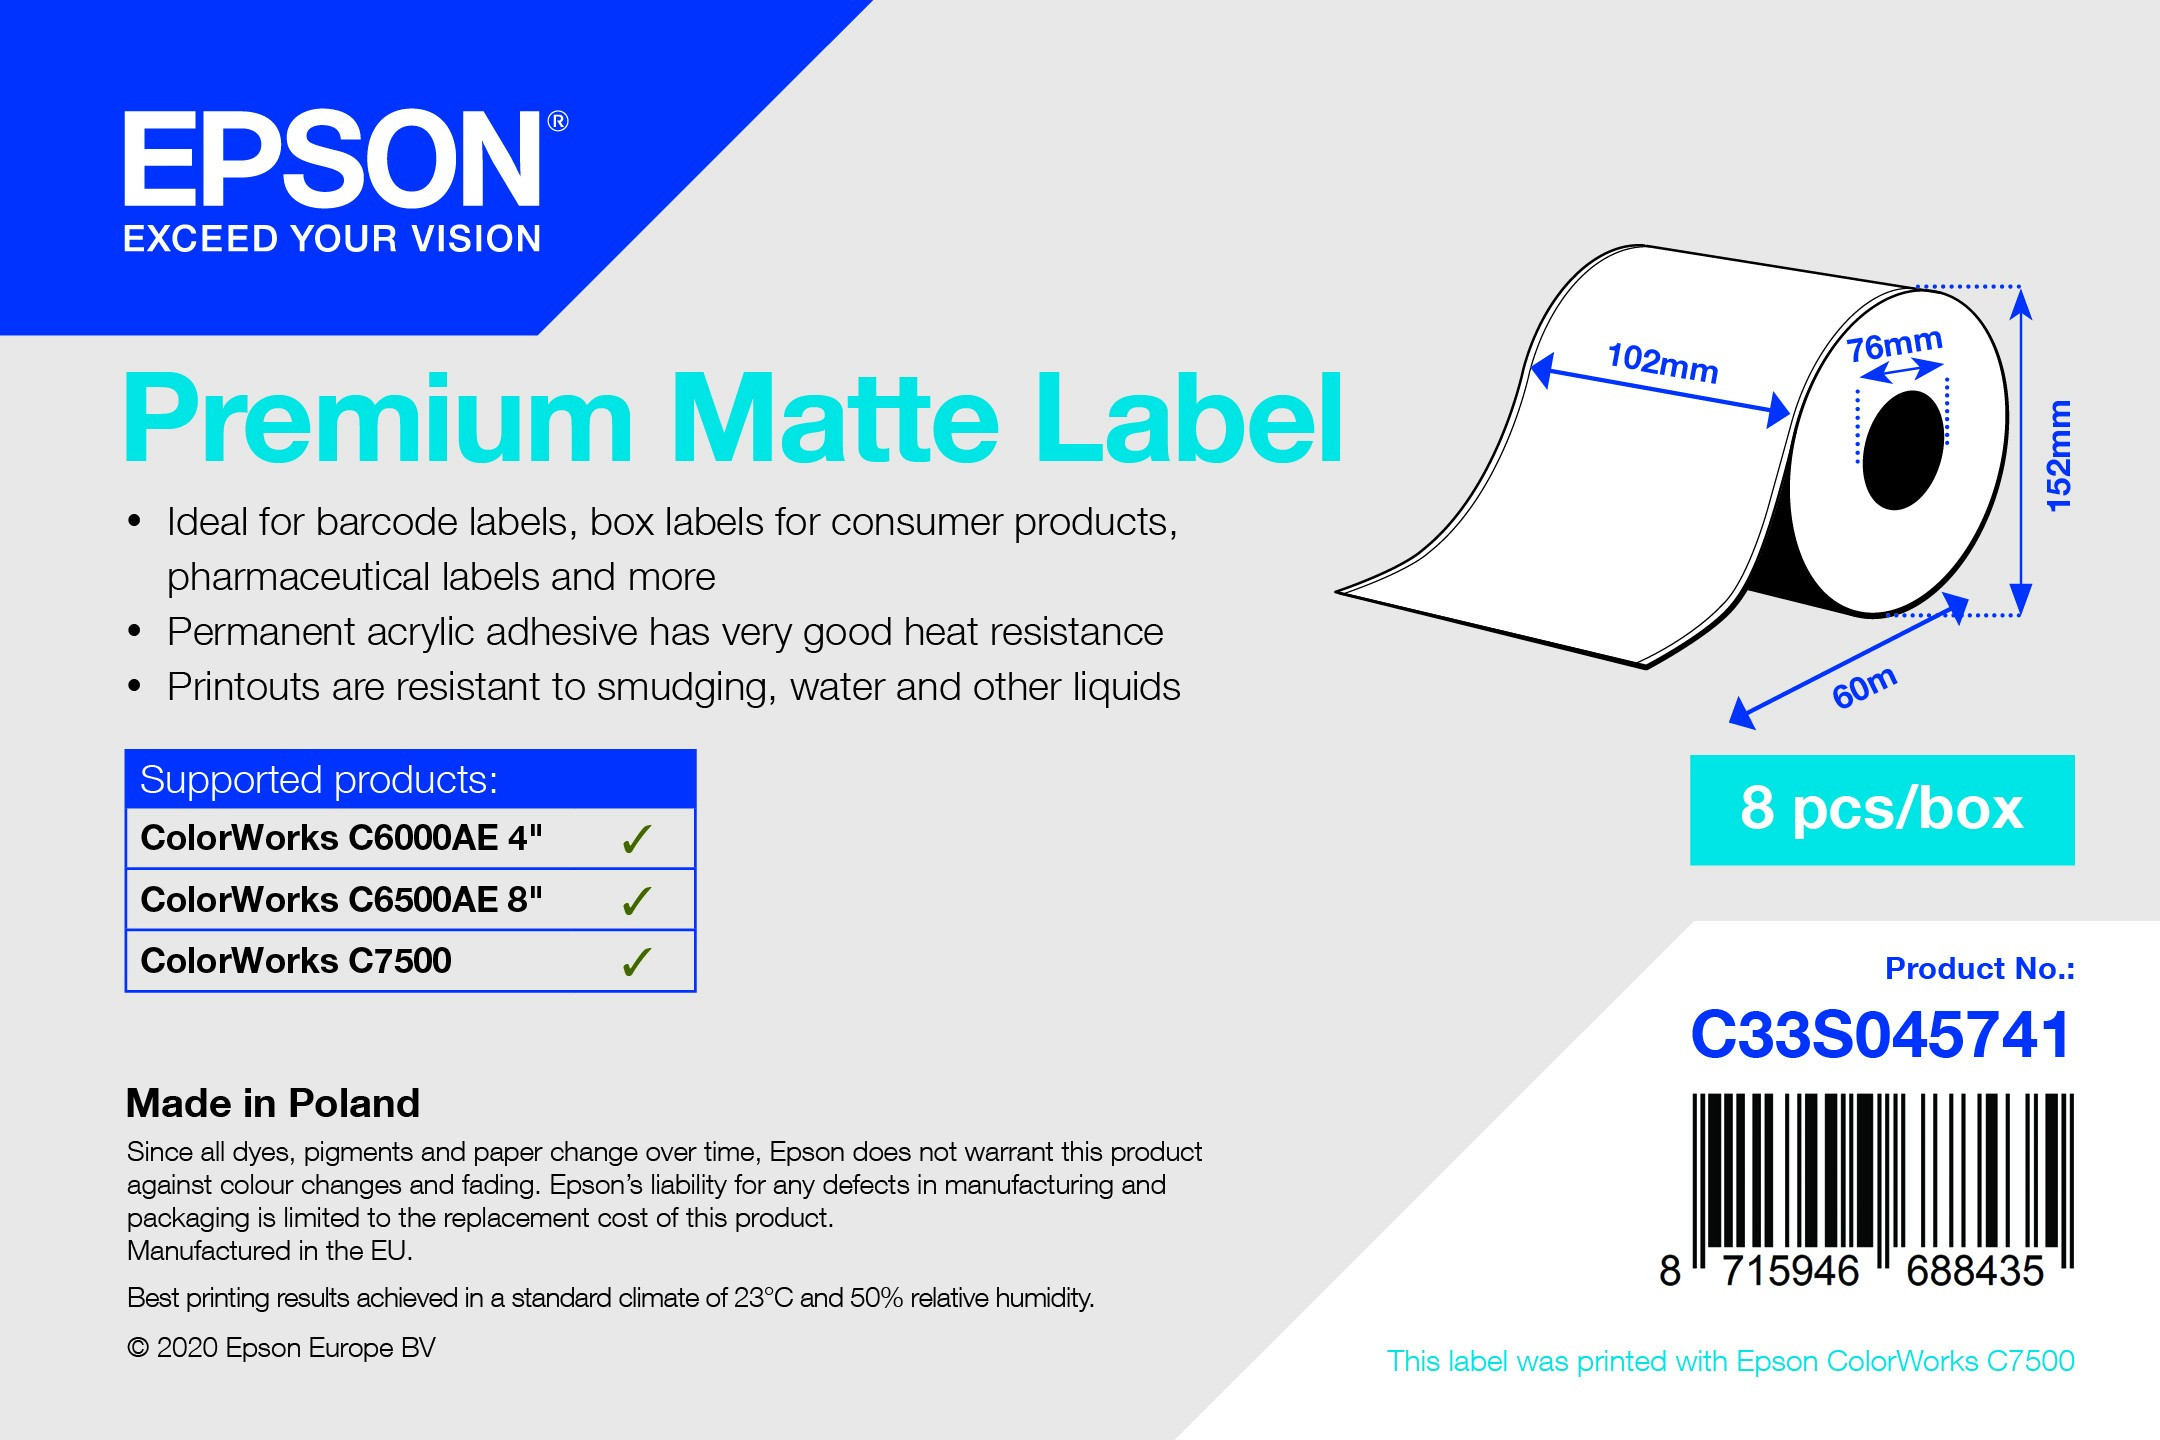 Epson 102mm X 60m matt címke